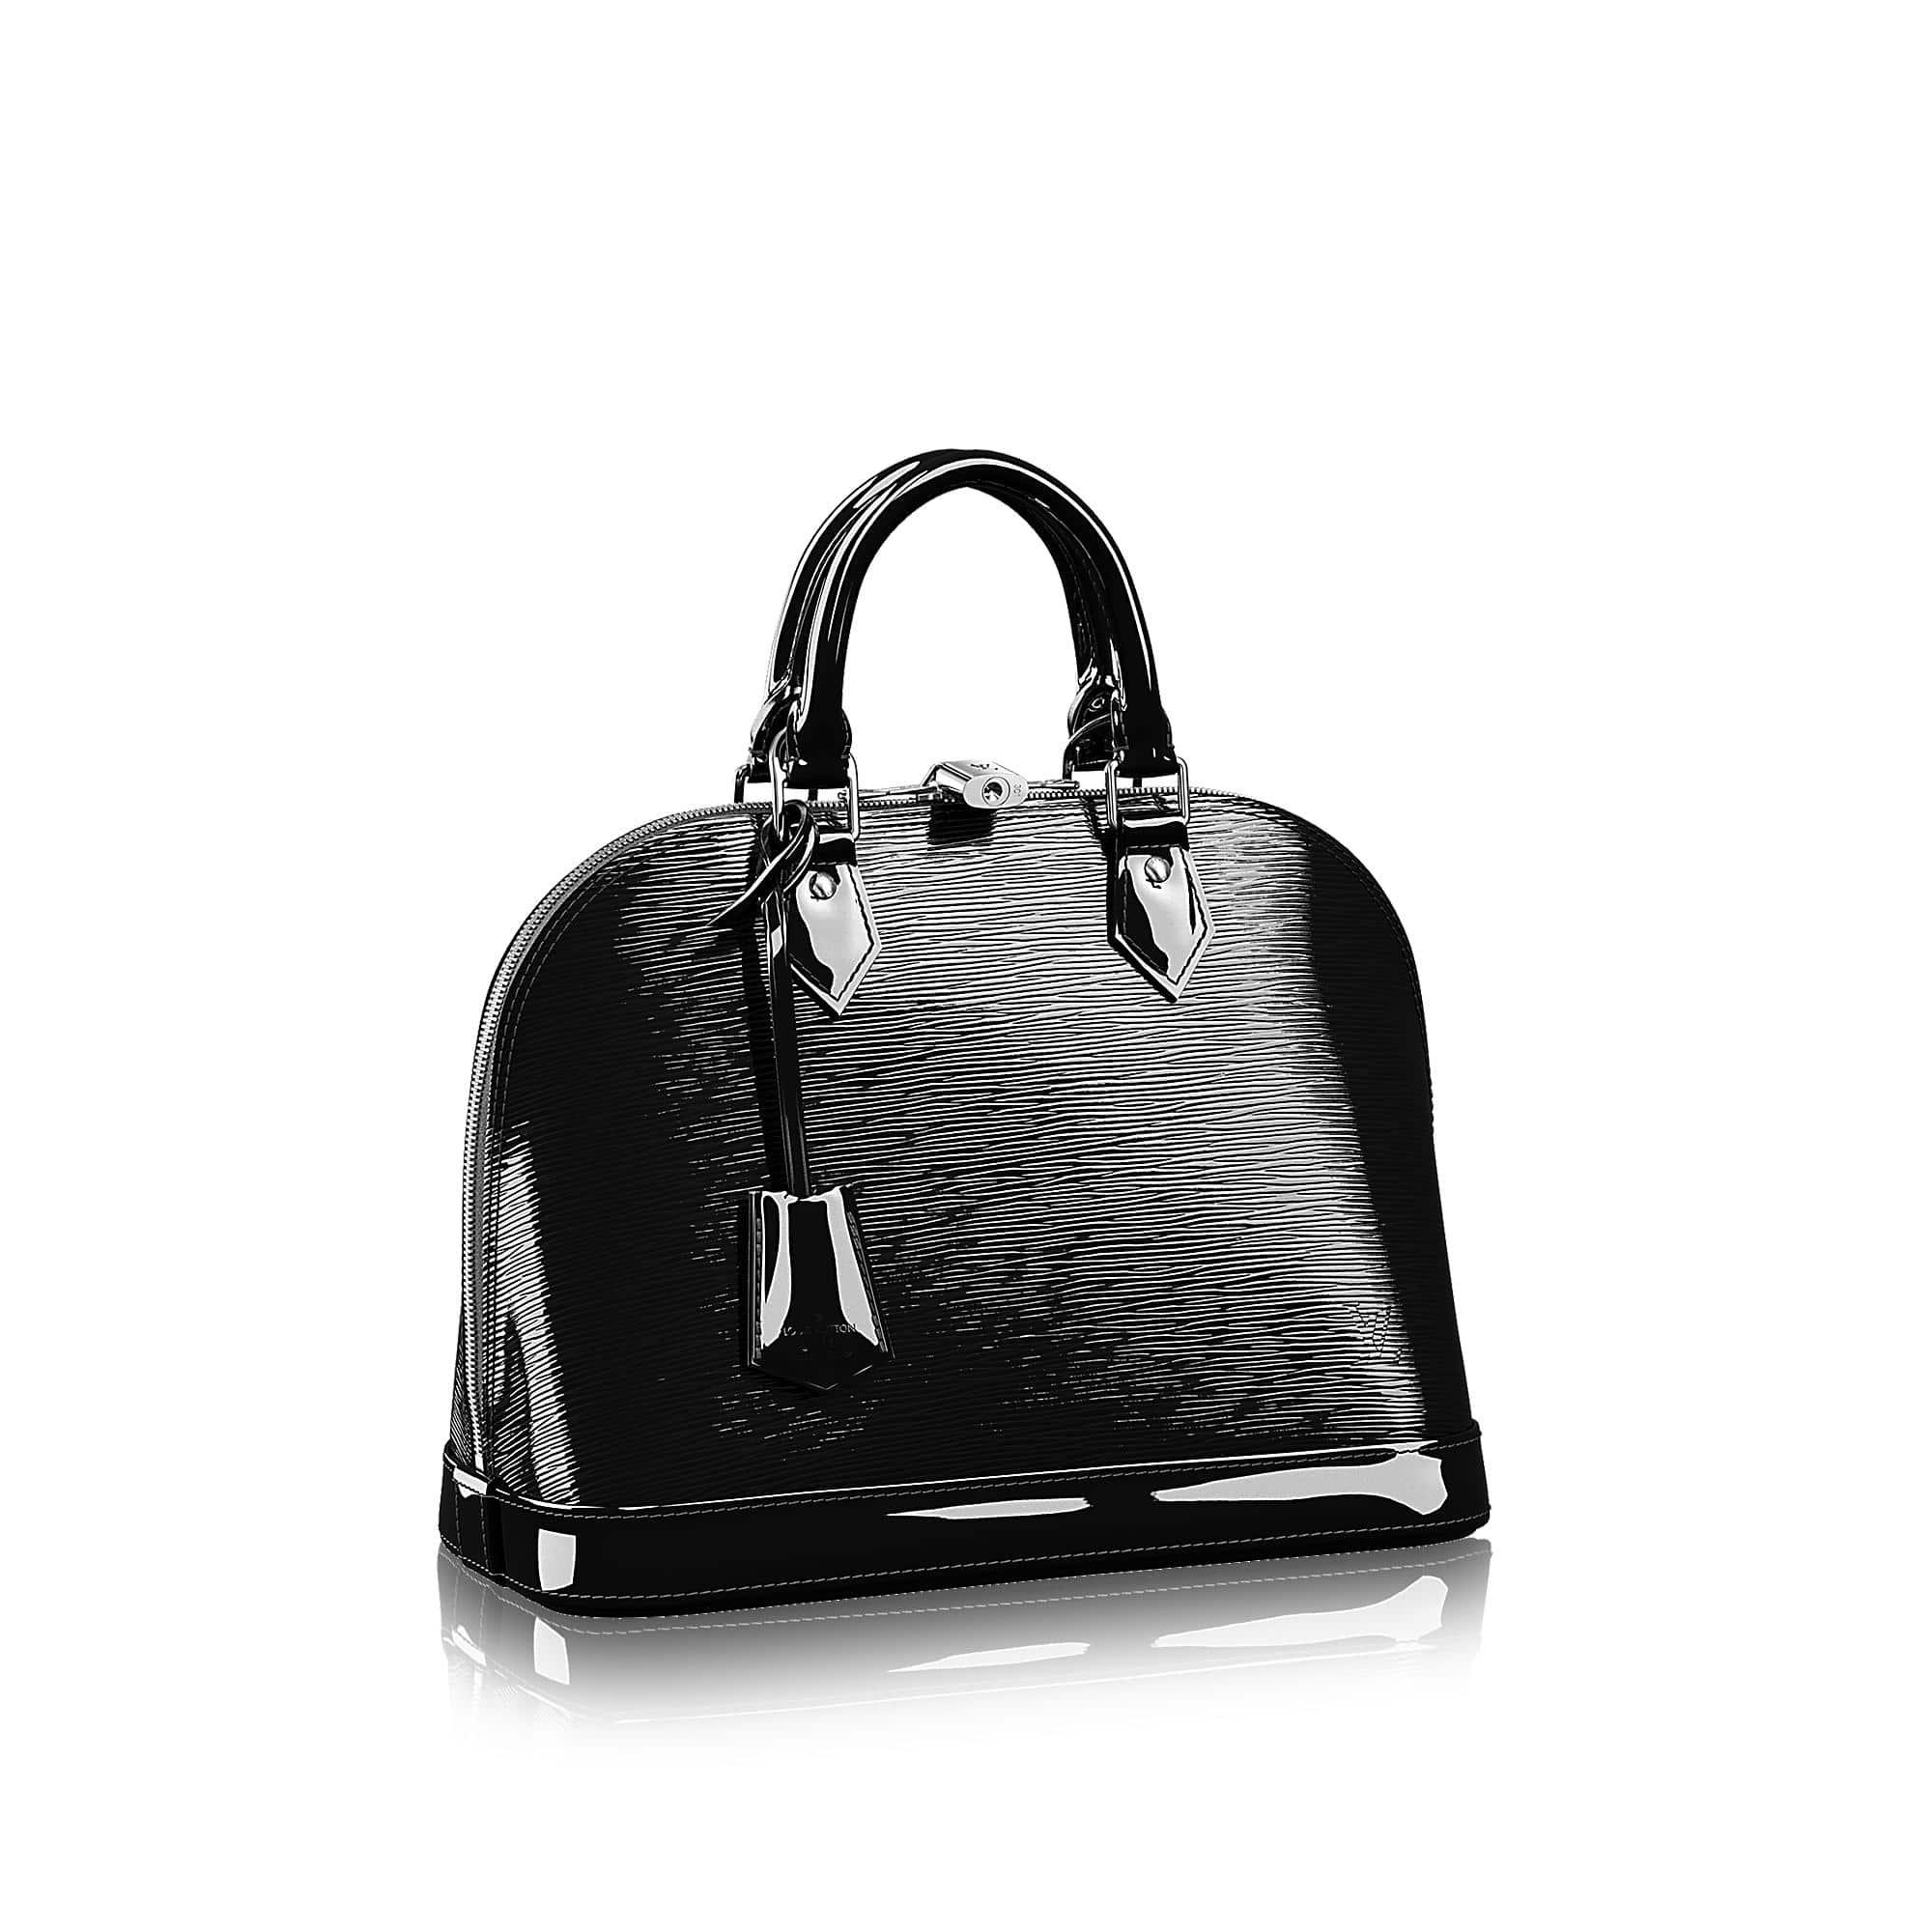 alma mm epi leather noir